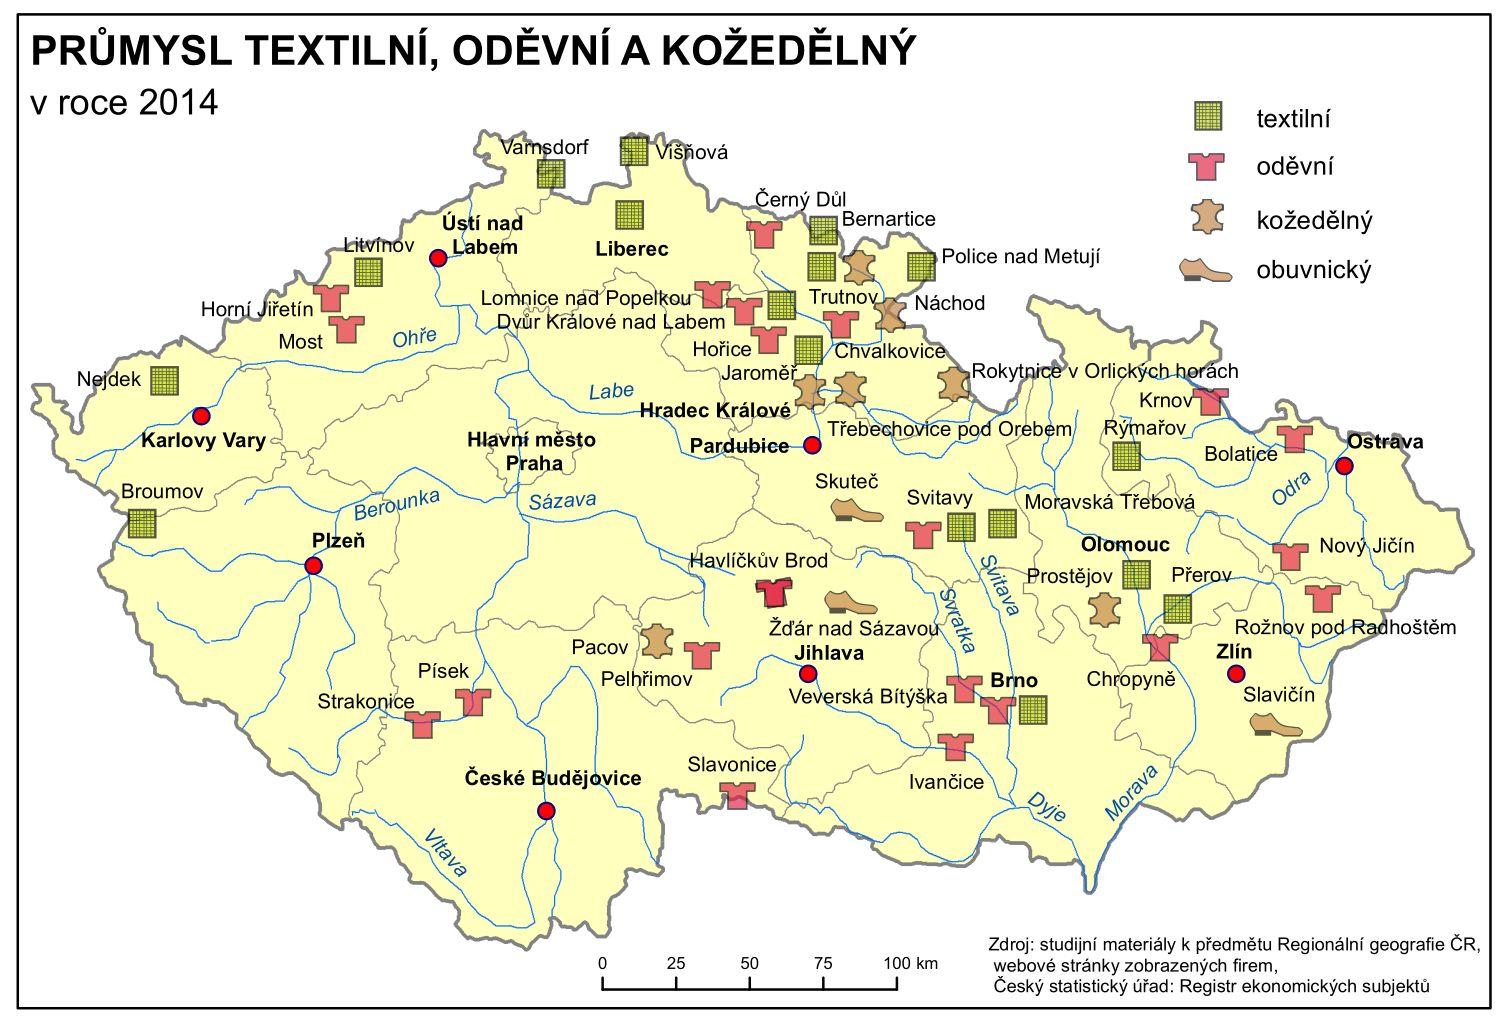 Hospodarstvi Ceska Republika Tematicky Atlas Pedagogicka